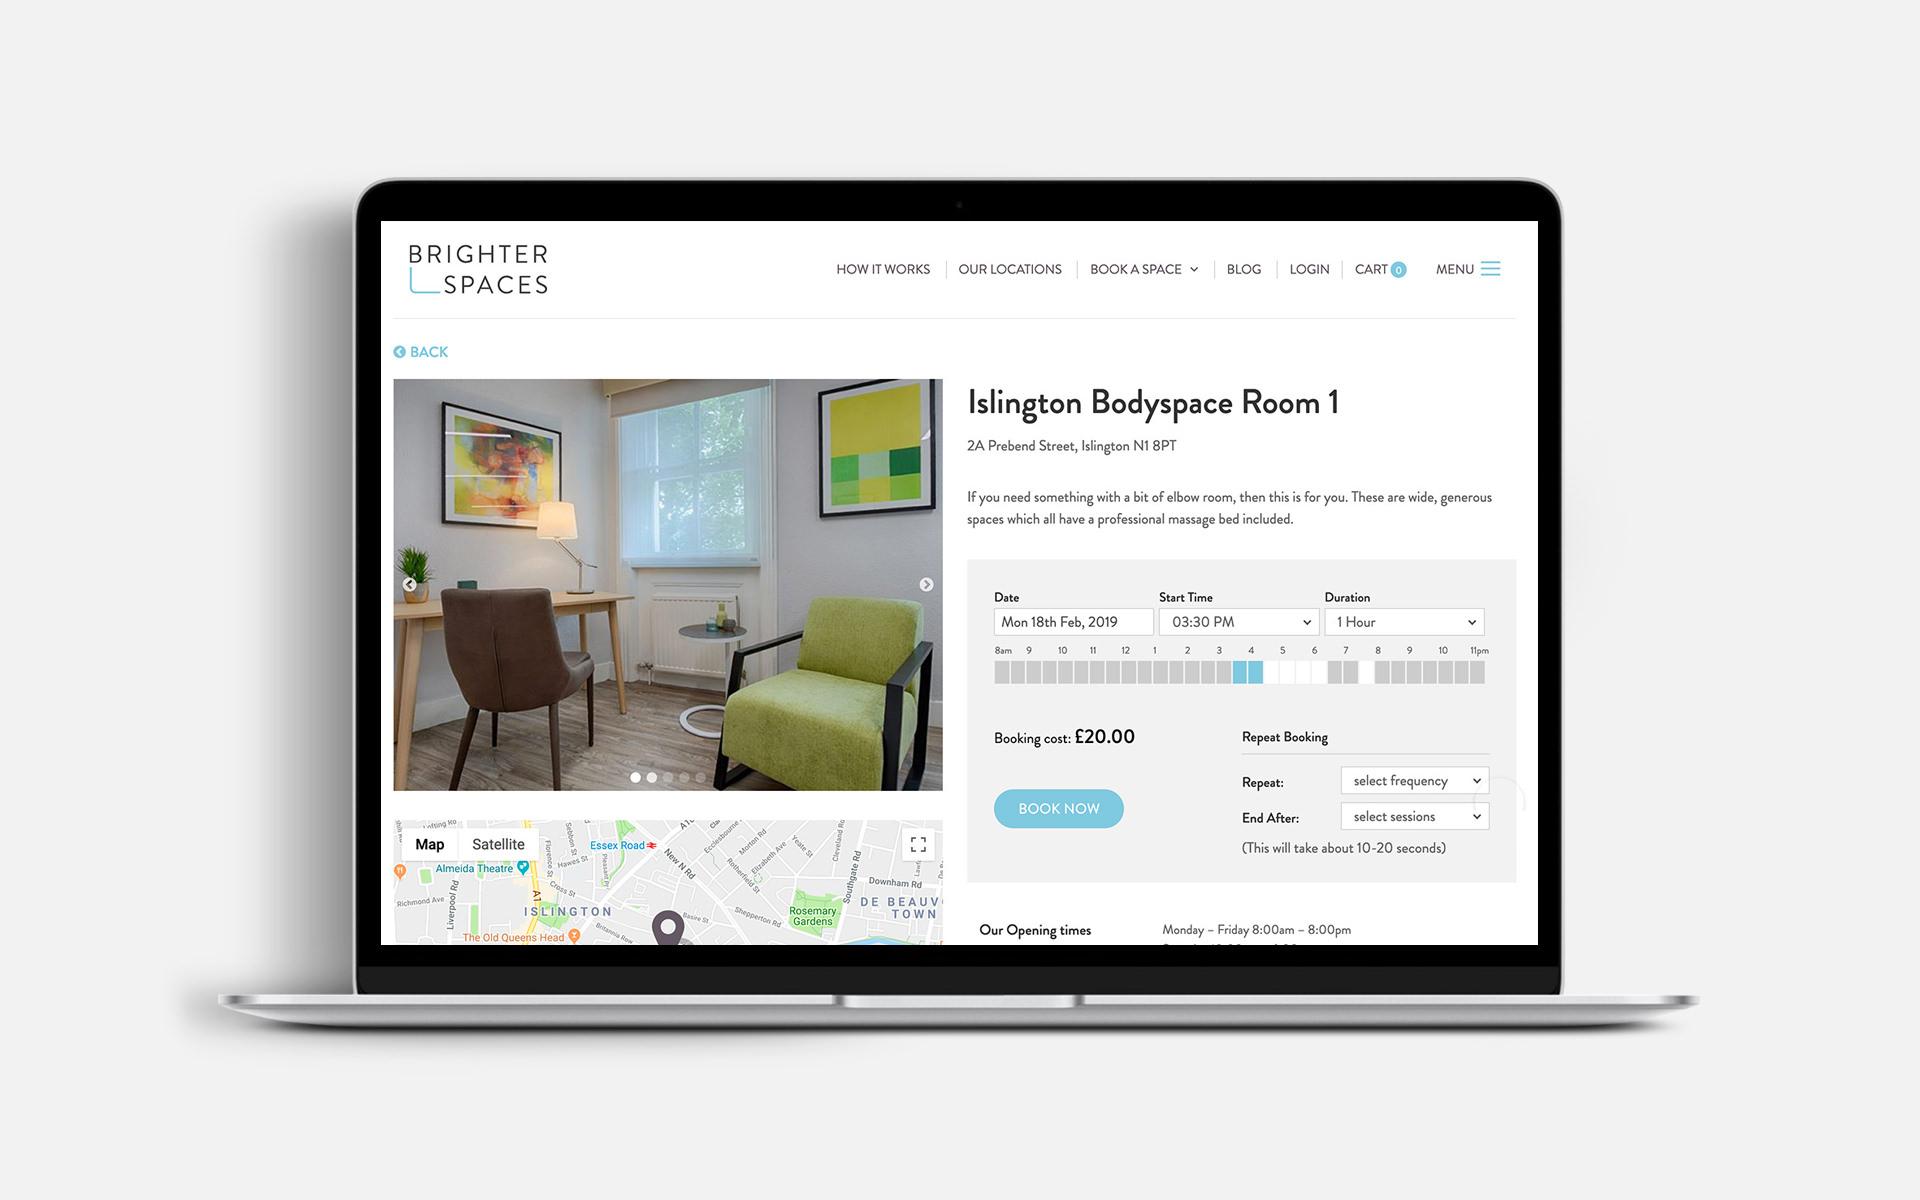 brighter-spaces-home-macbook-3